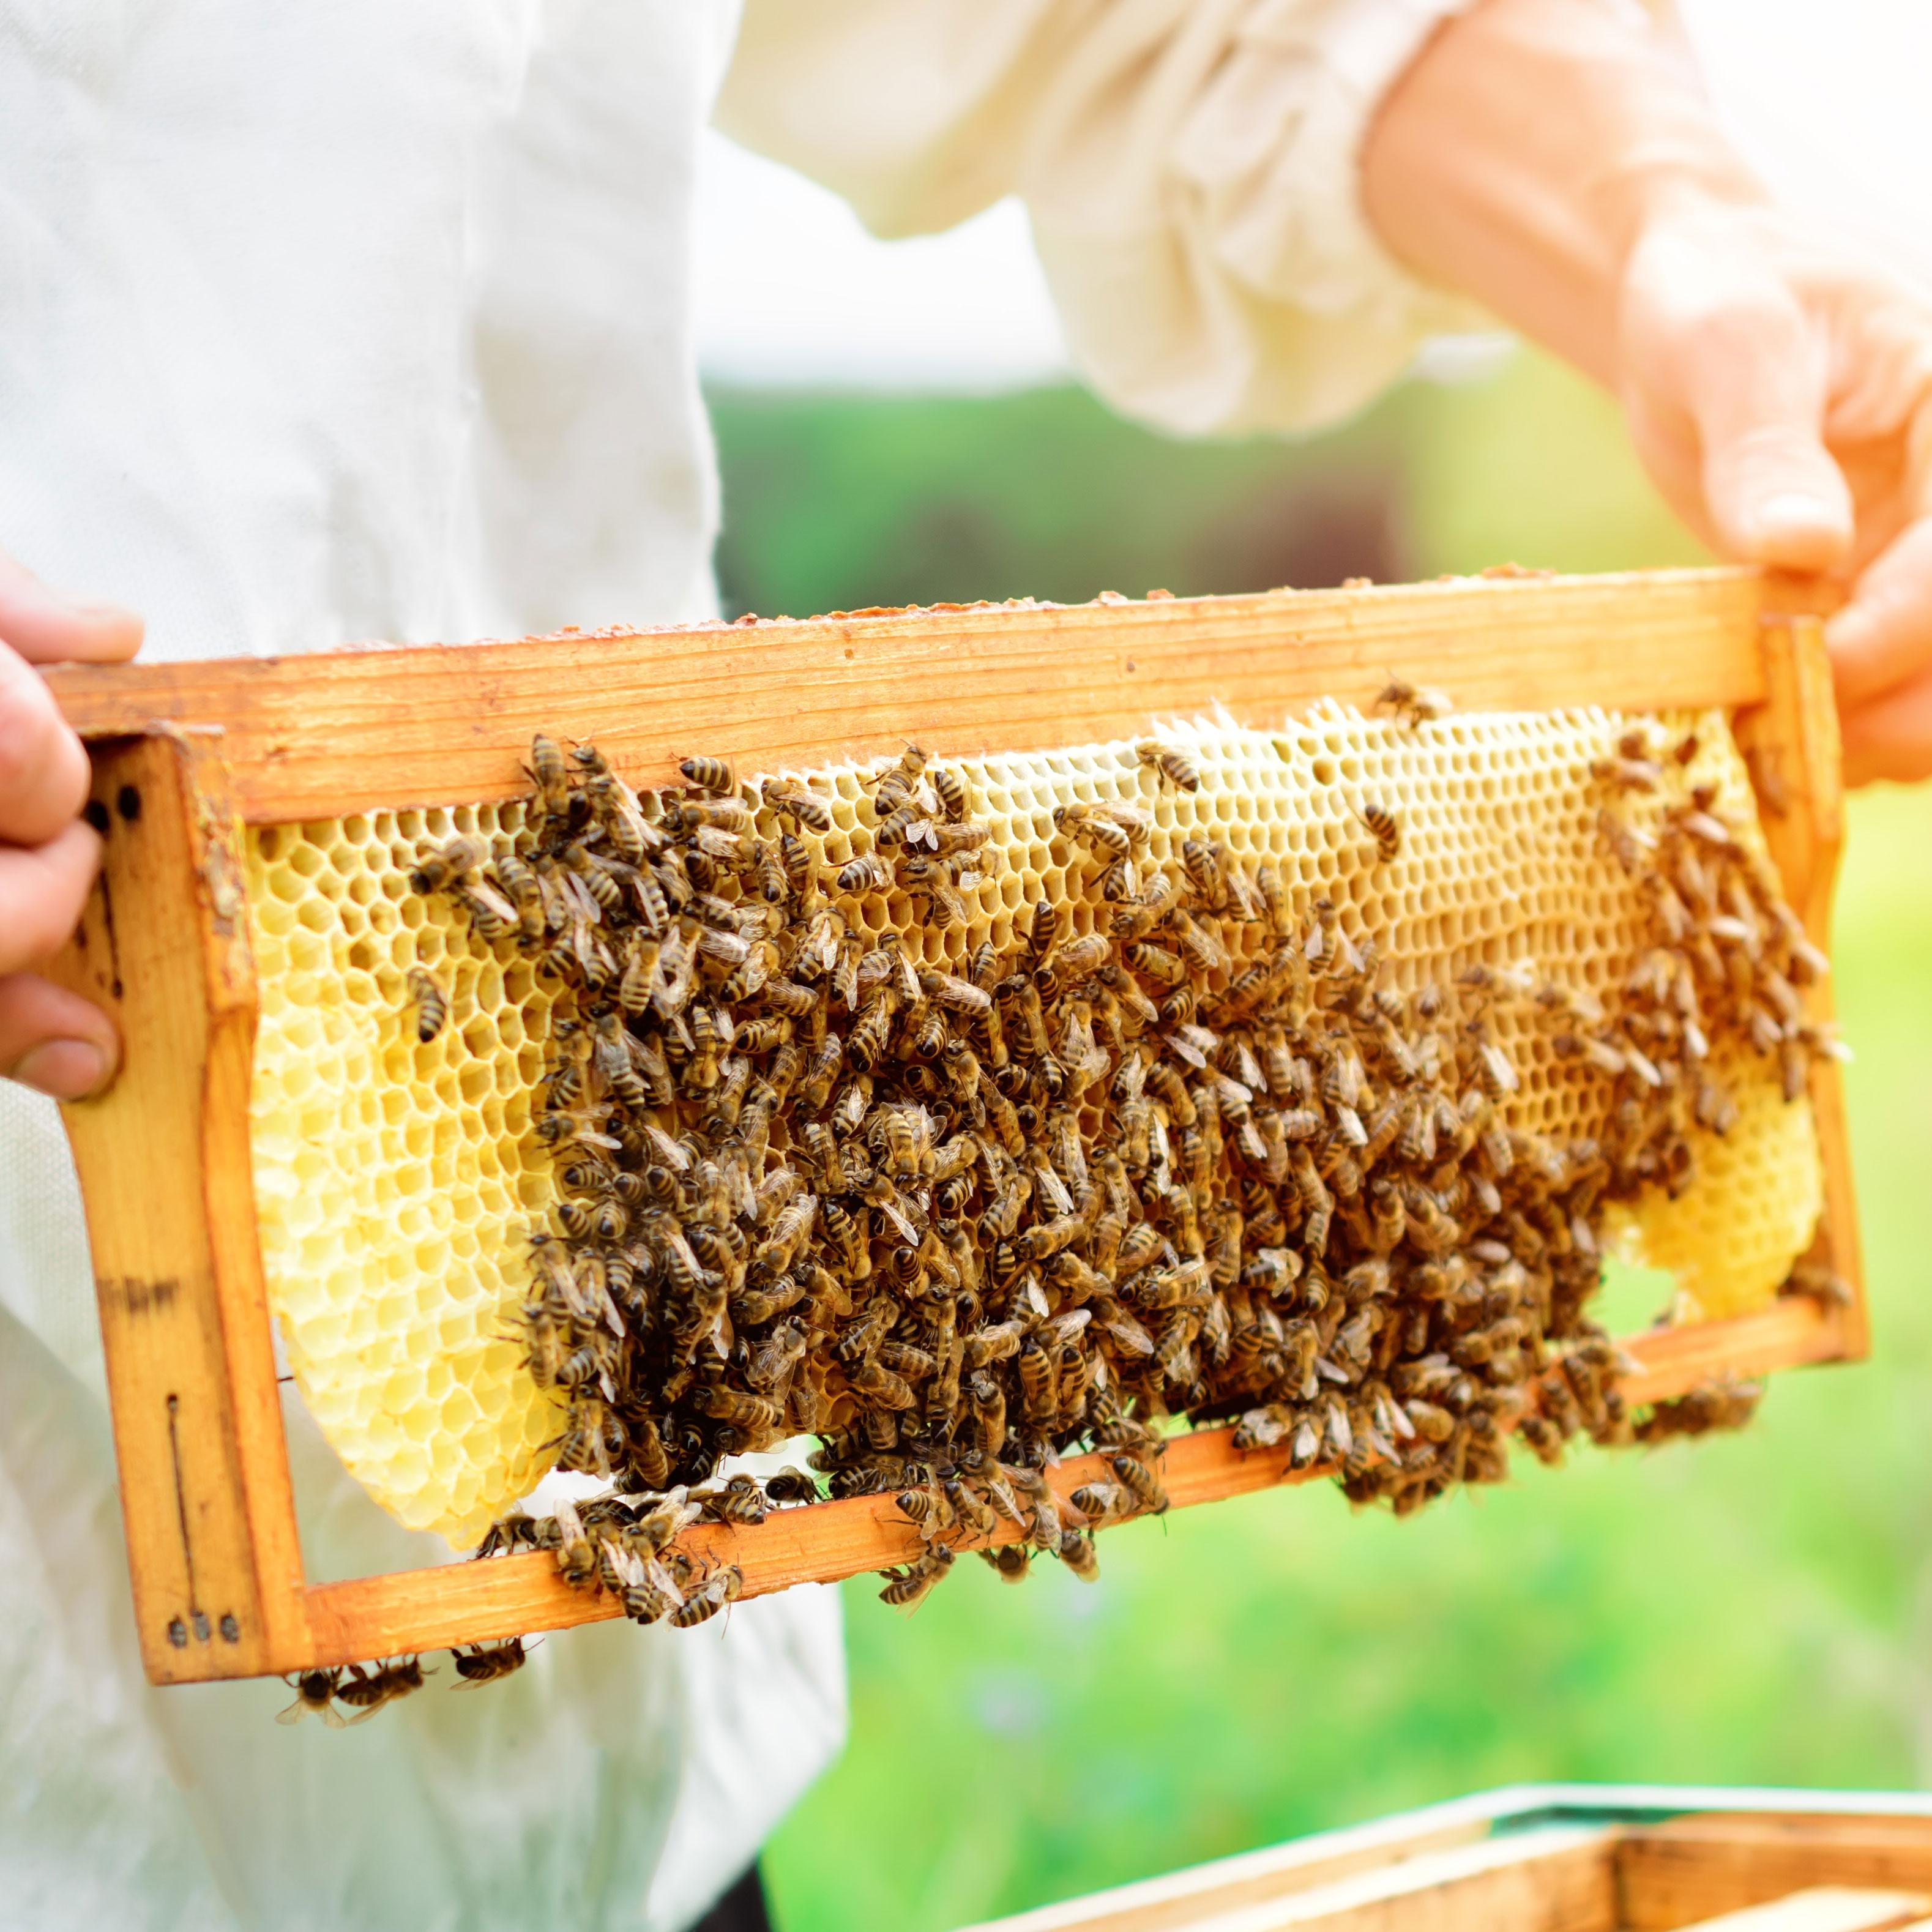 K&N Honey fresh from the hive